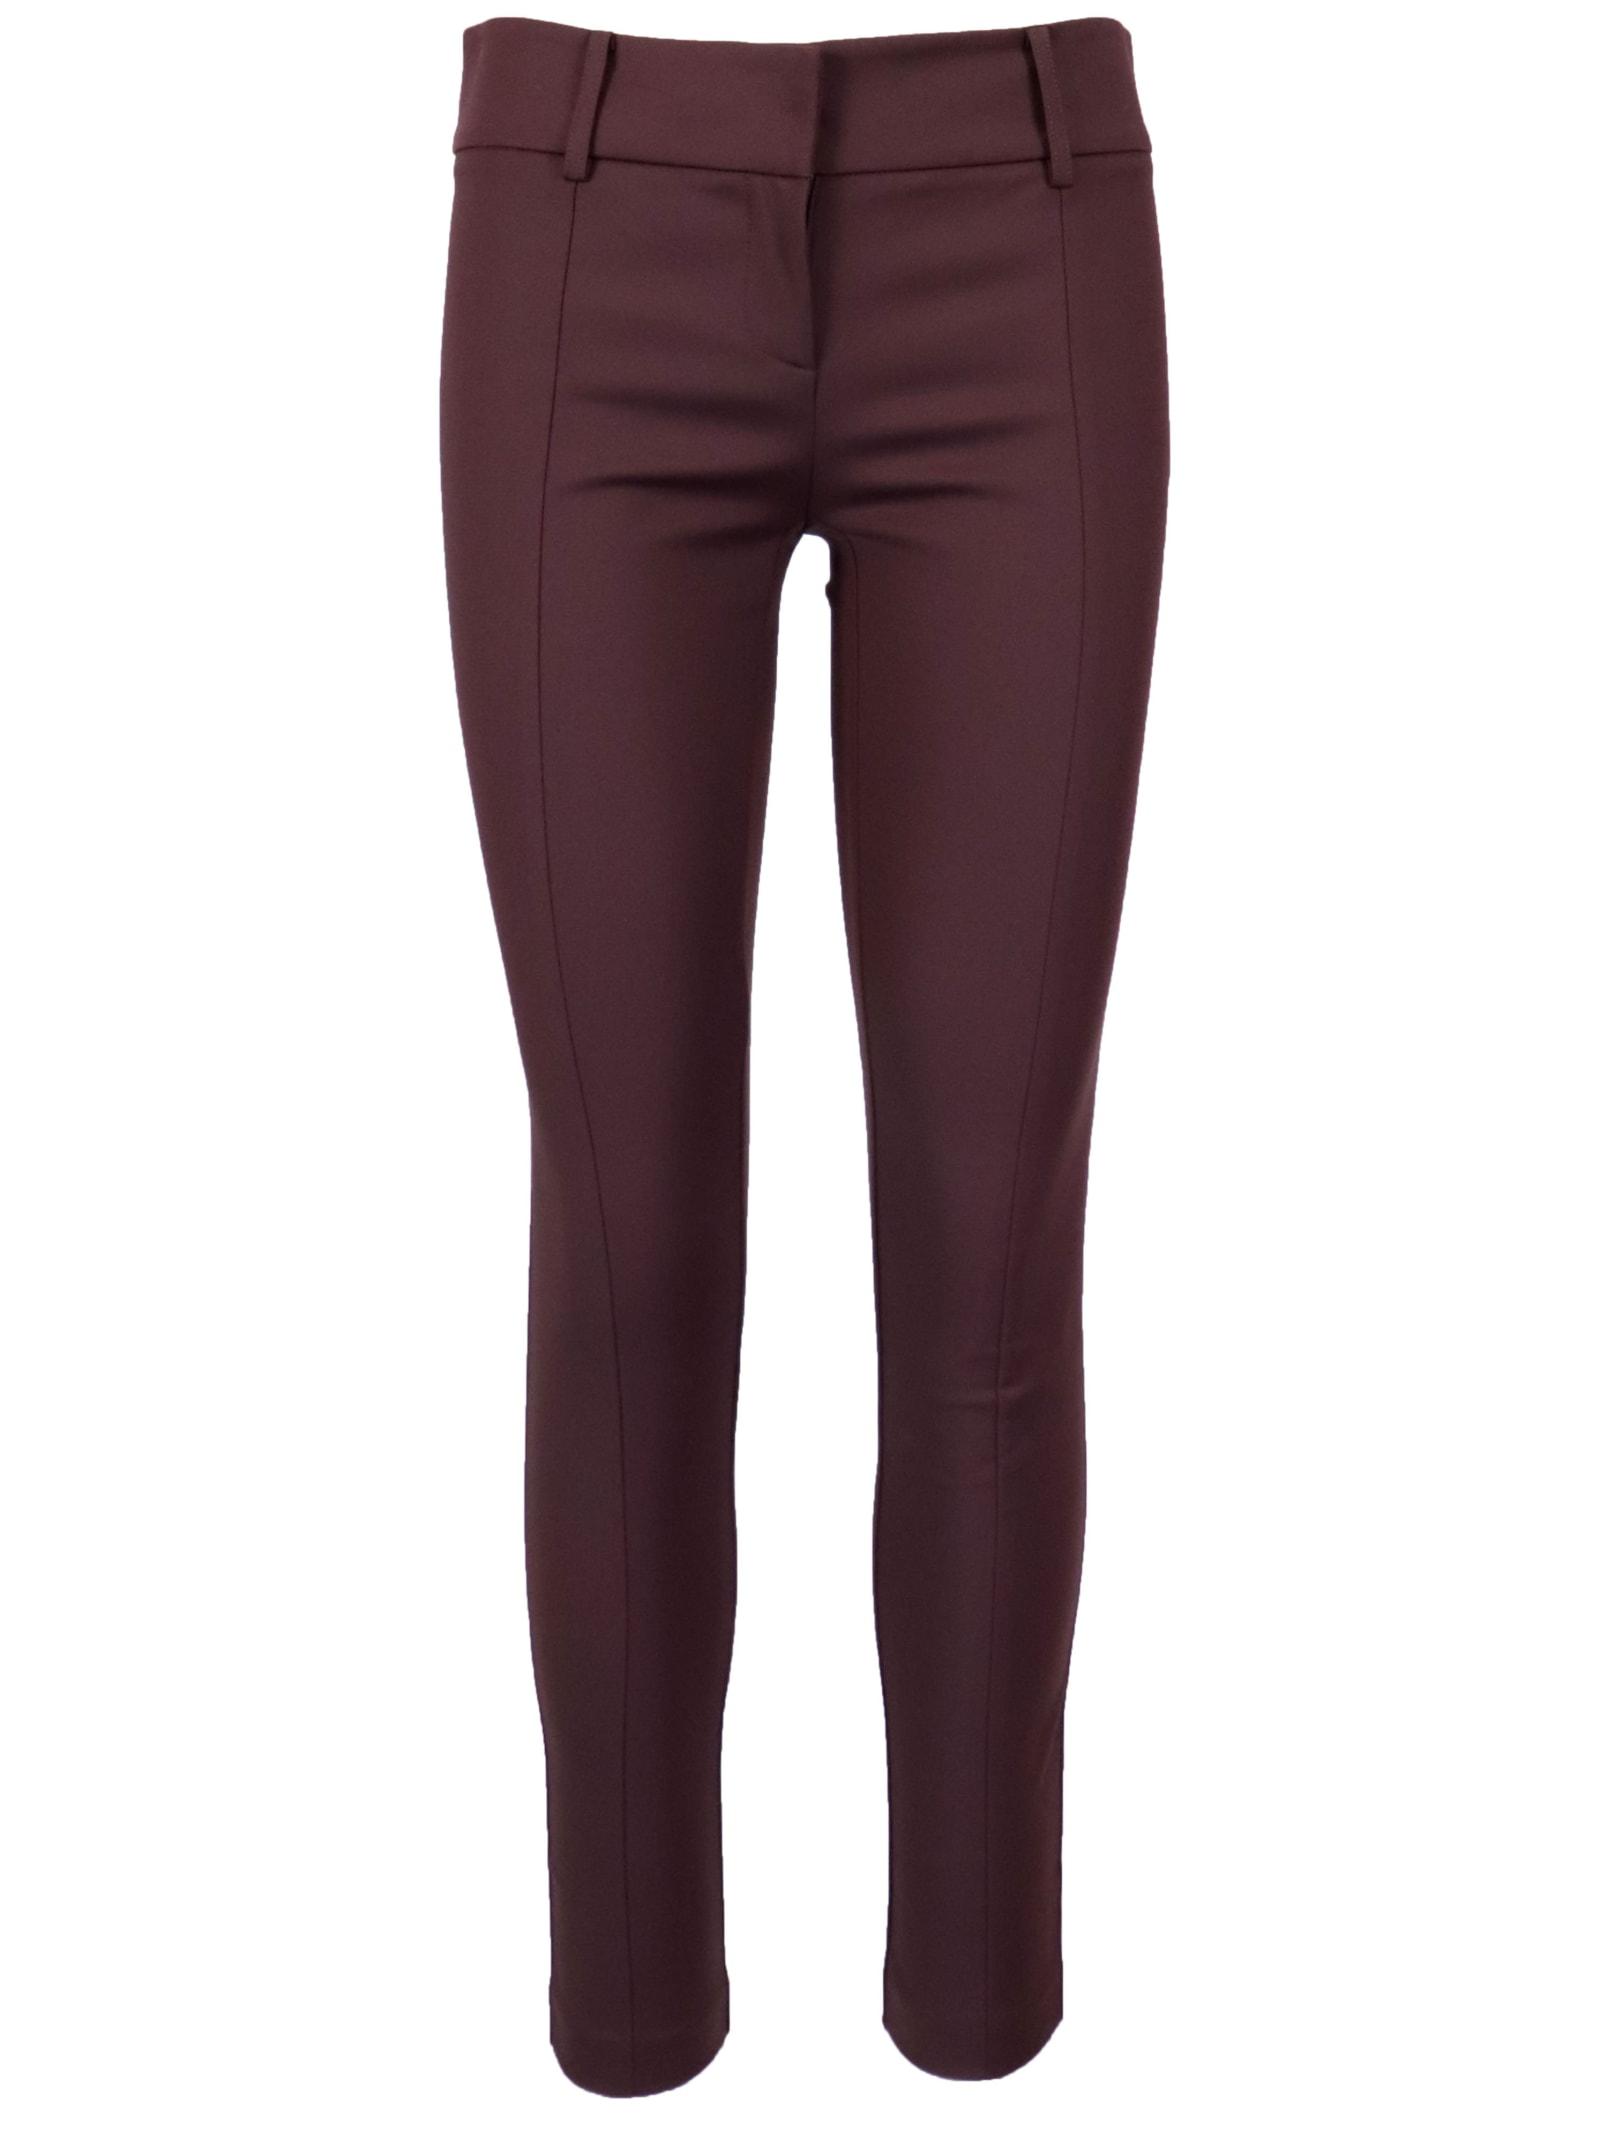 Patrizia Pepe Trousers Trousers